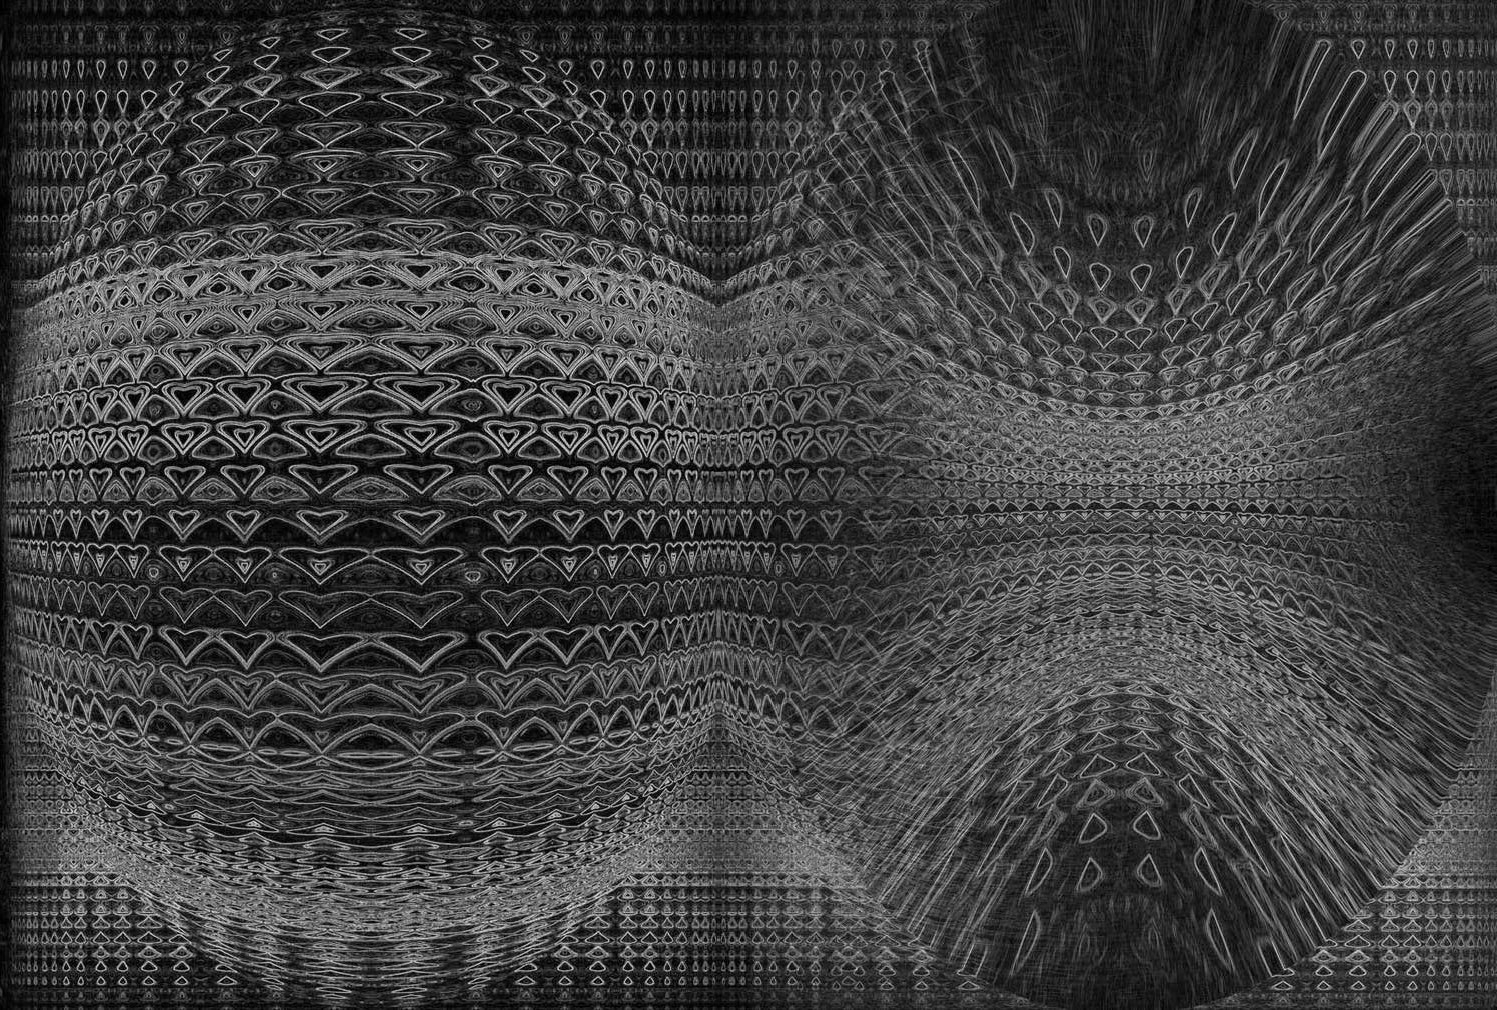 tessellation .#landscapes.#scie - zygzwurx | ello